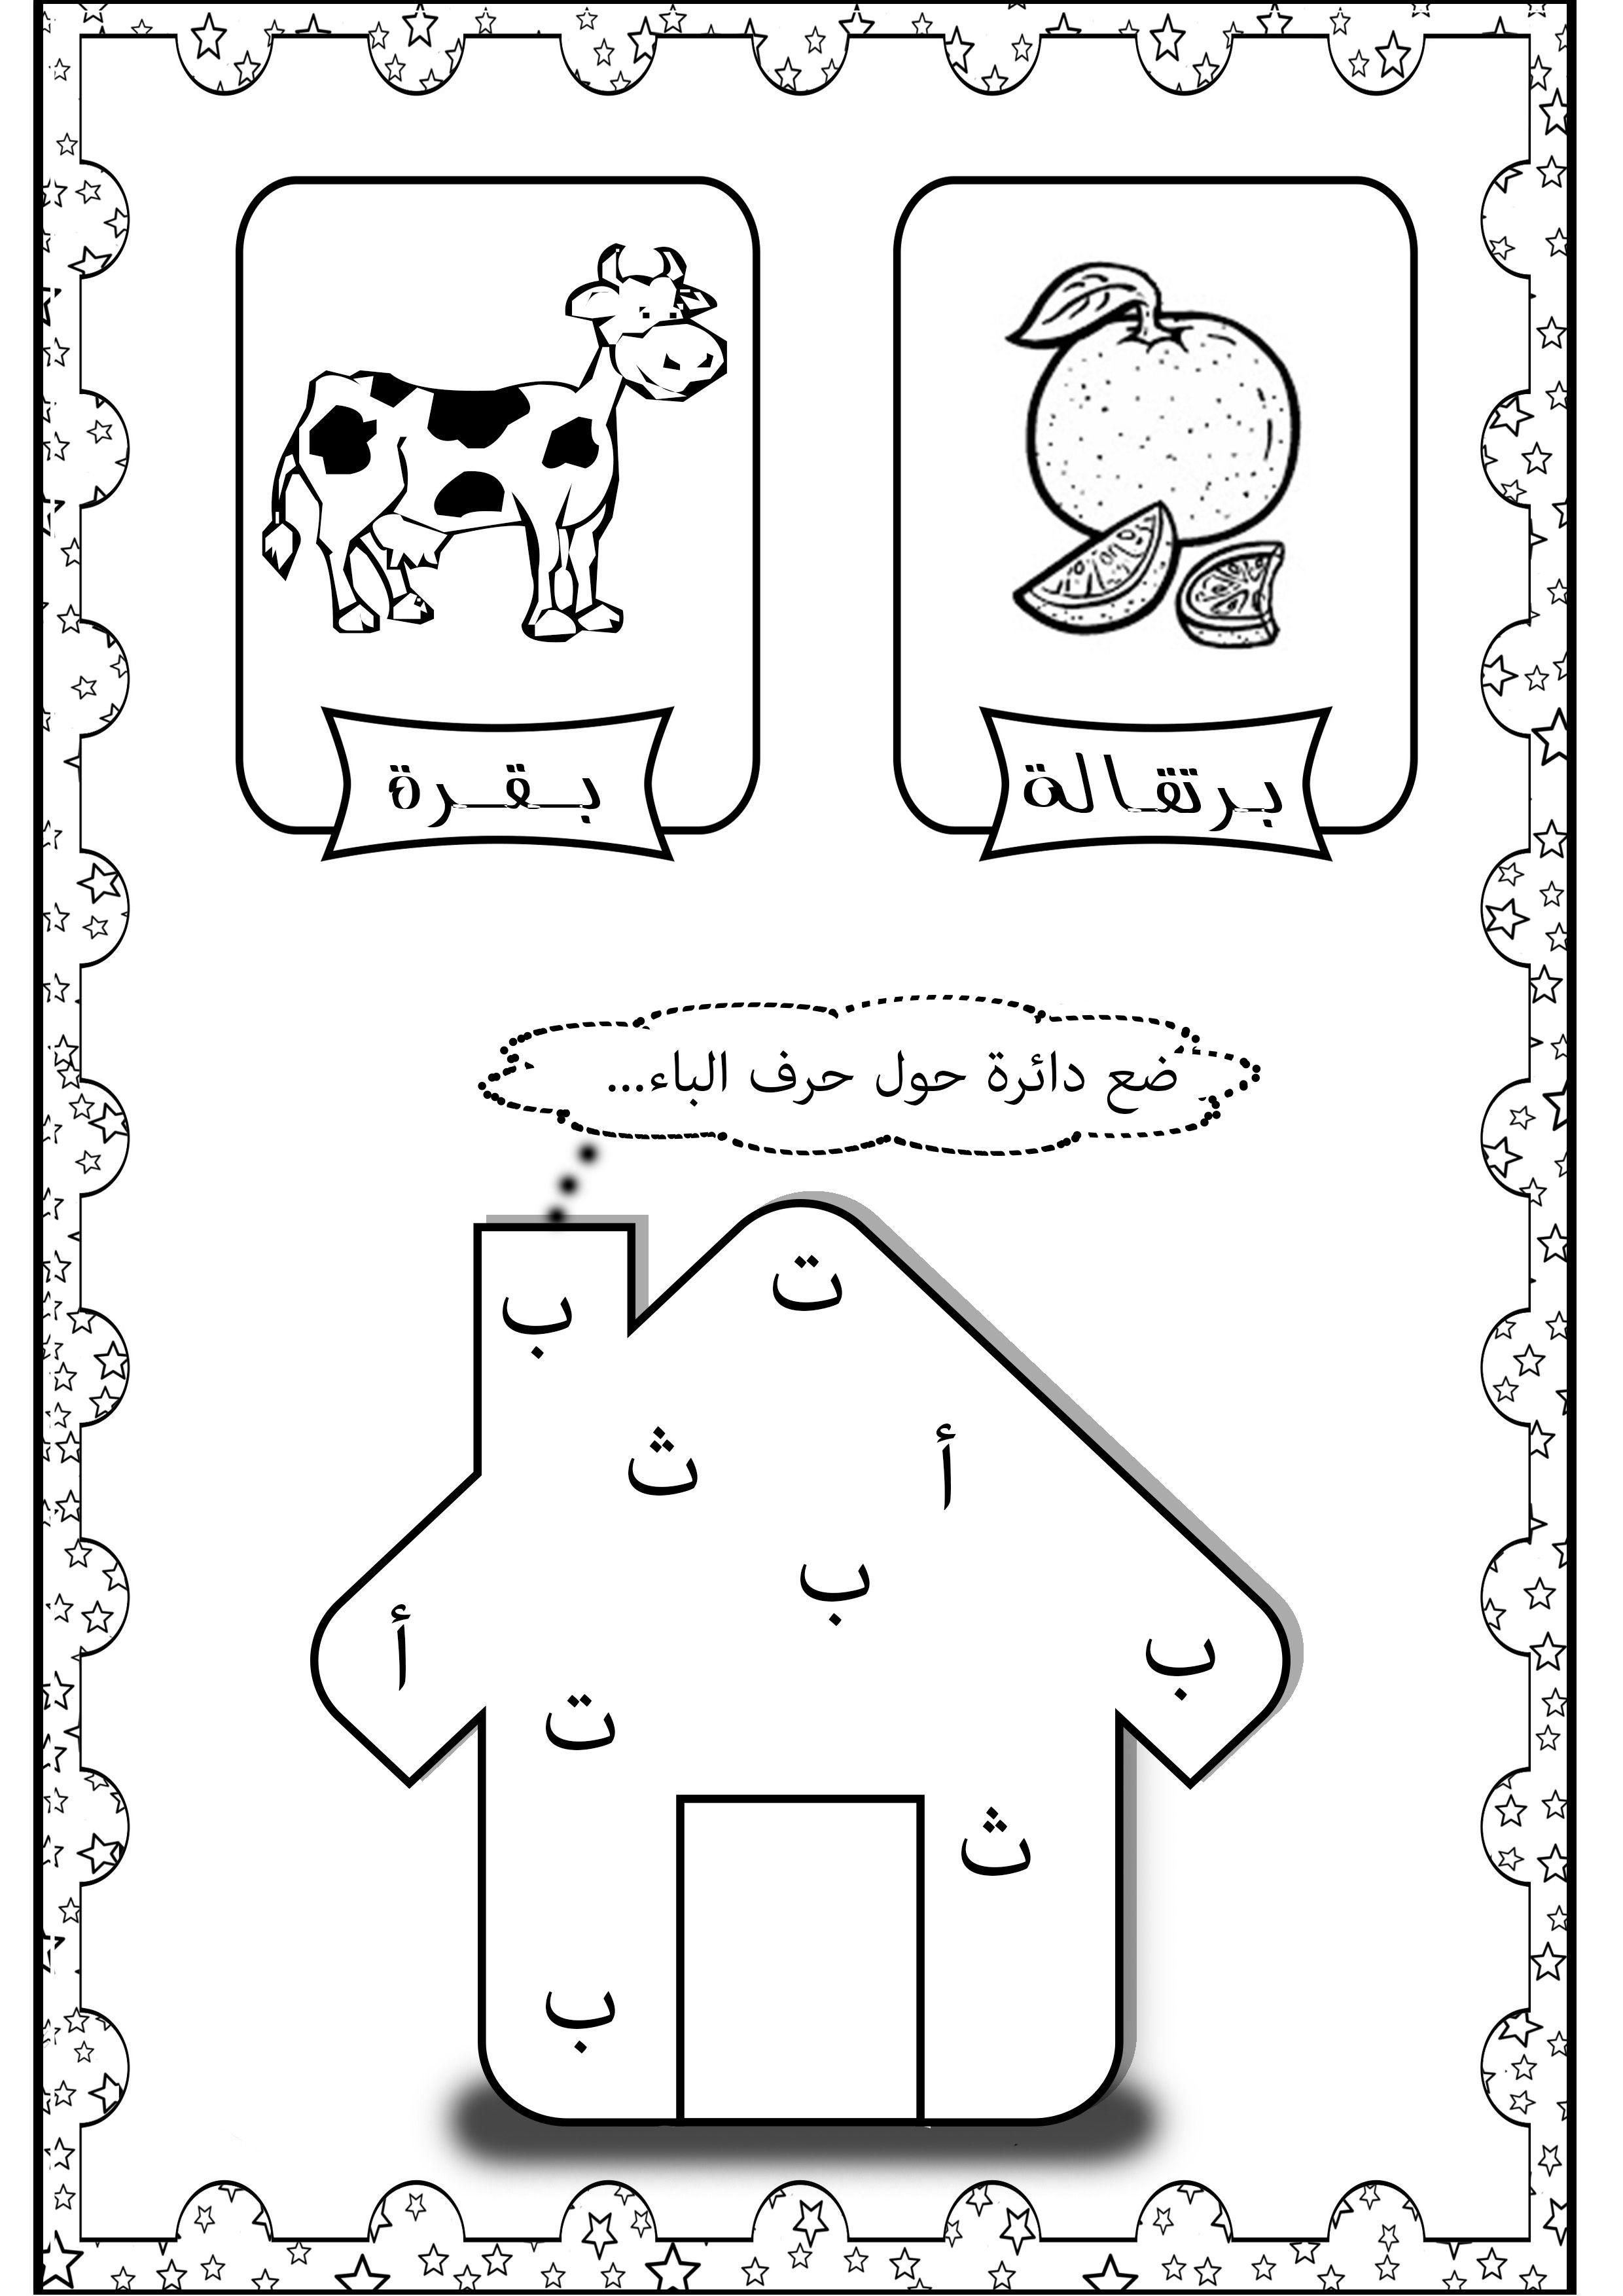 Pin By Elyamama On أوراق عمل Arabic Alphabet For Kids Arabic Kids Learn Arabic Online